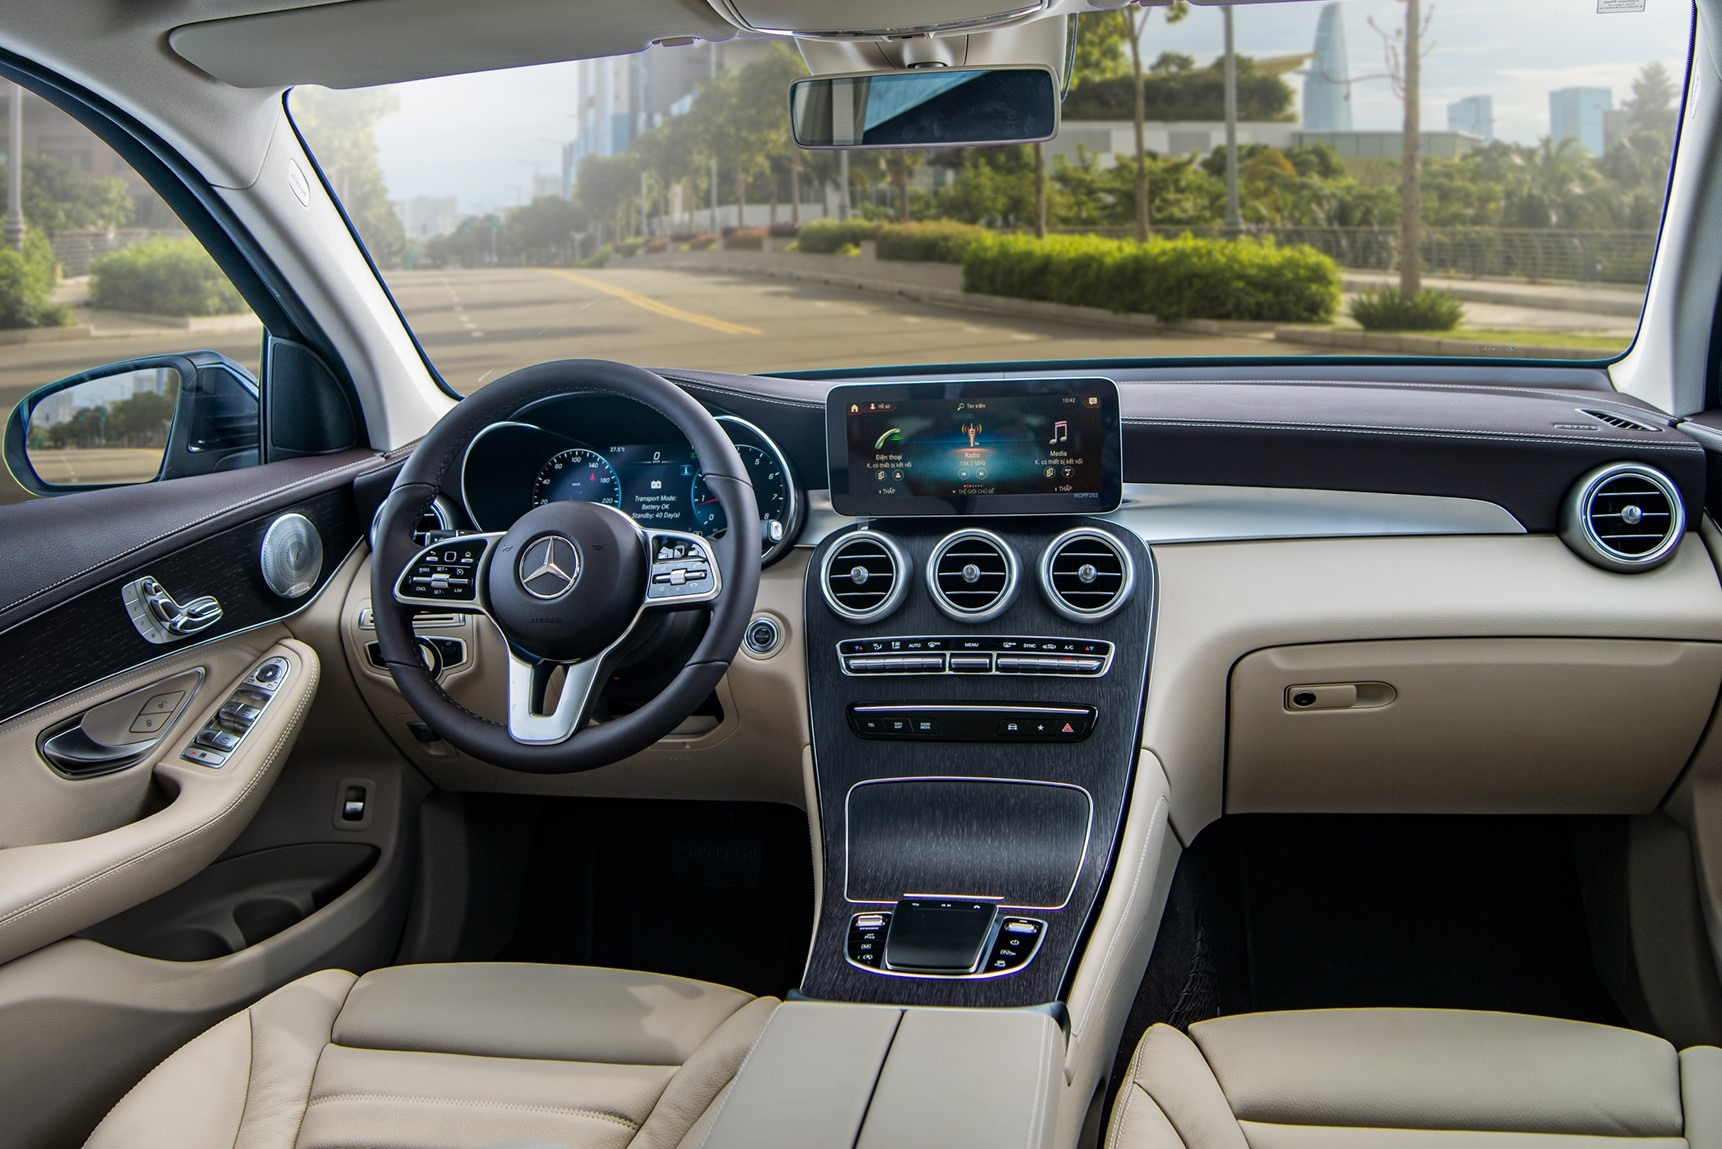 Audi Q5 2021 canh tranh Mercedes GLC anh 8